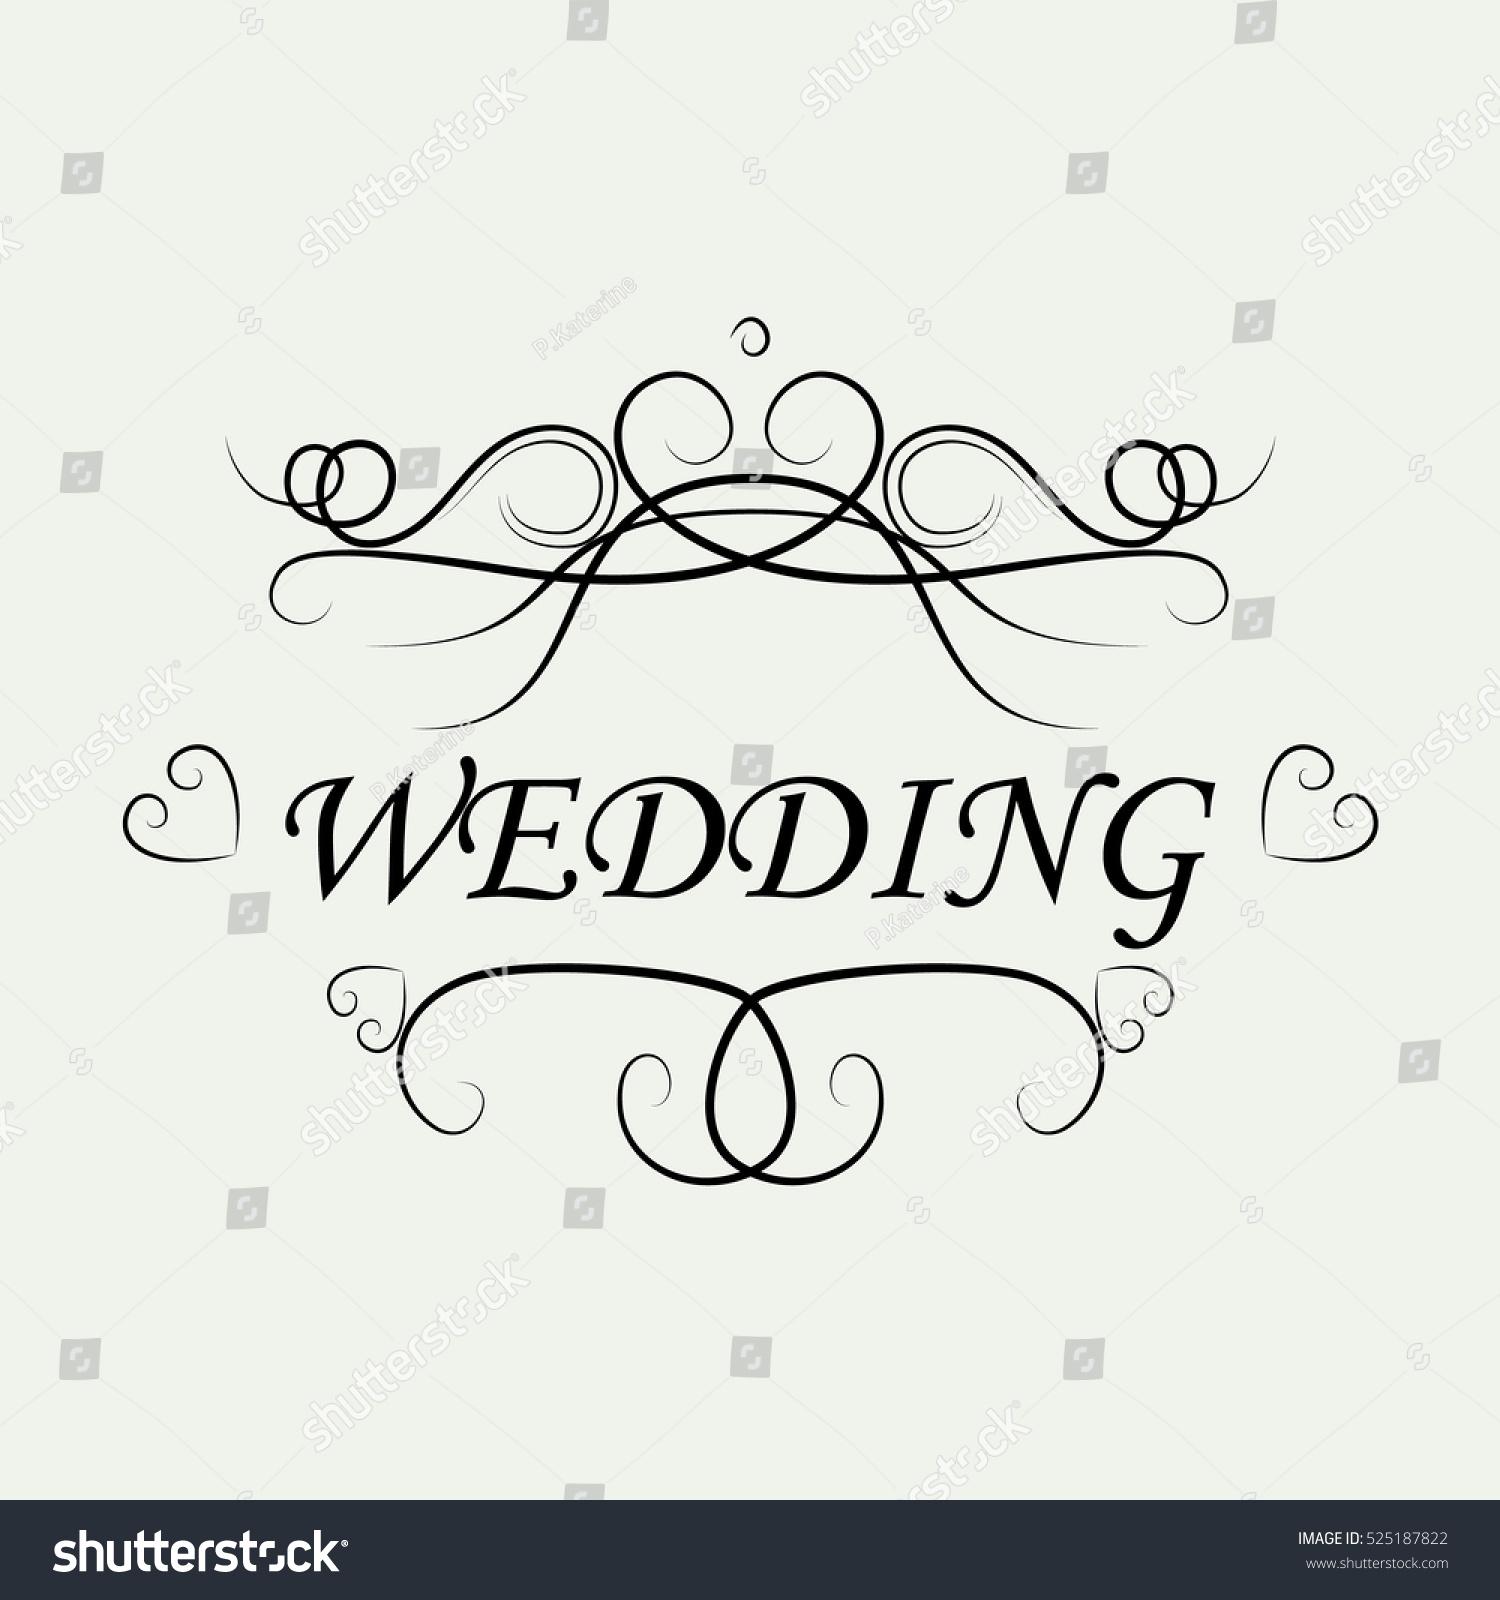 Wedding invitation card ornamental decorative elementsvector stock wedding invitation card ornamental decorative elementsctor illustrationntage and filigree decoration junglespirit Image collections